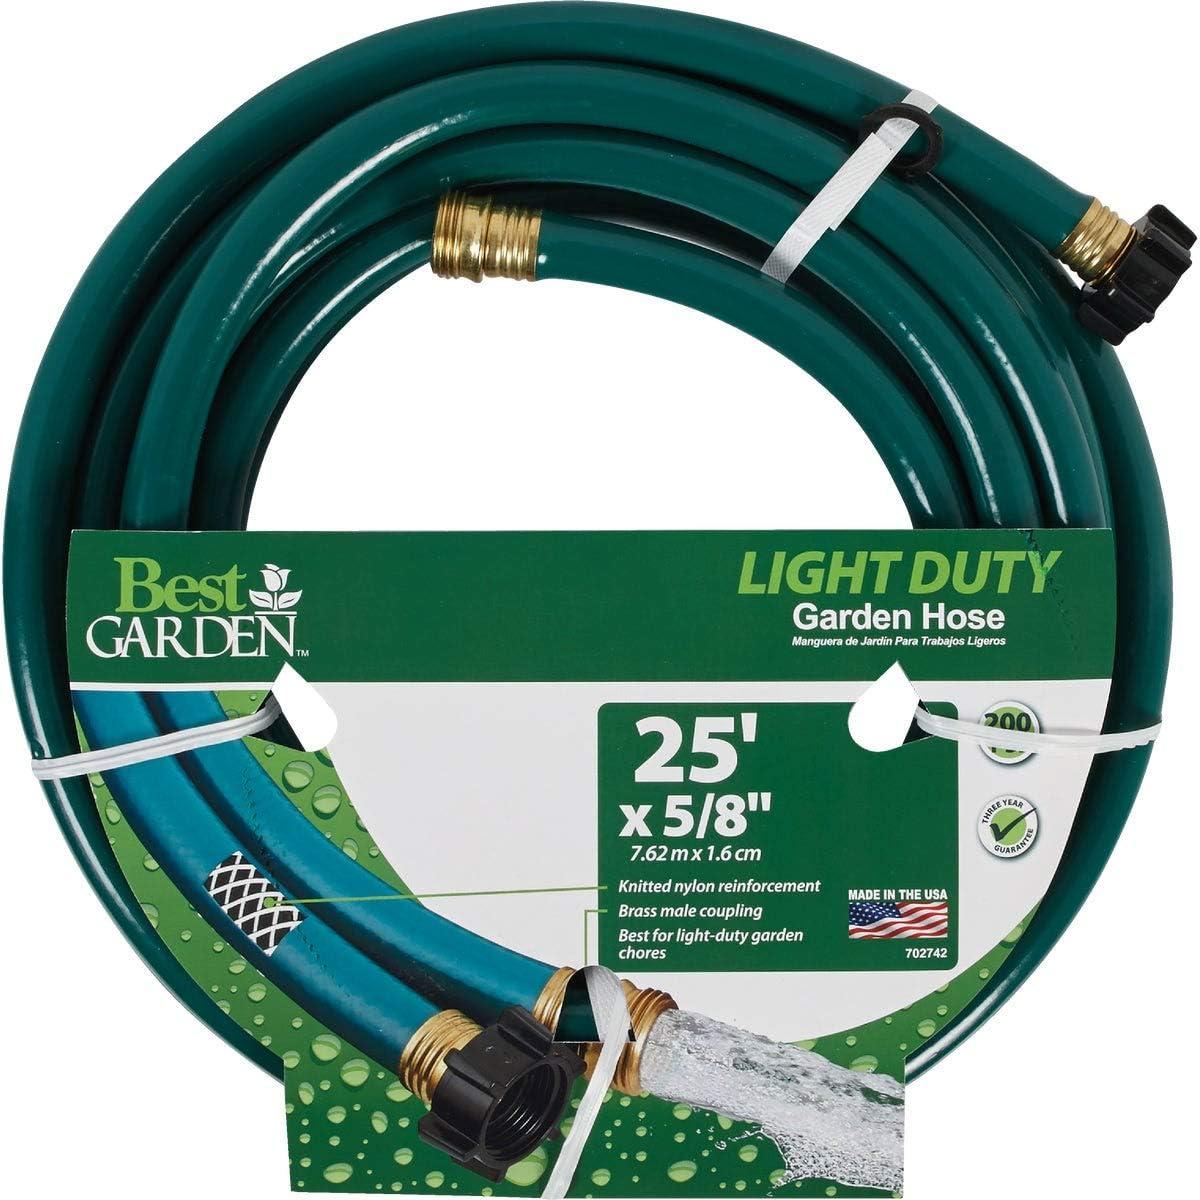 Best Garden 5/8 in. Dia. x 25 Ft. L. Light-Duty Garden Hose - 1 Each